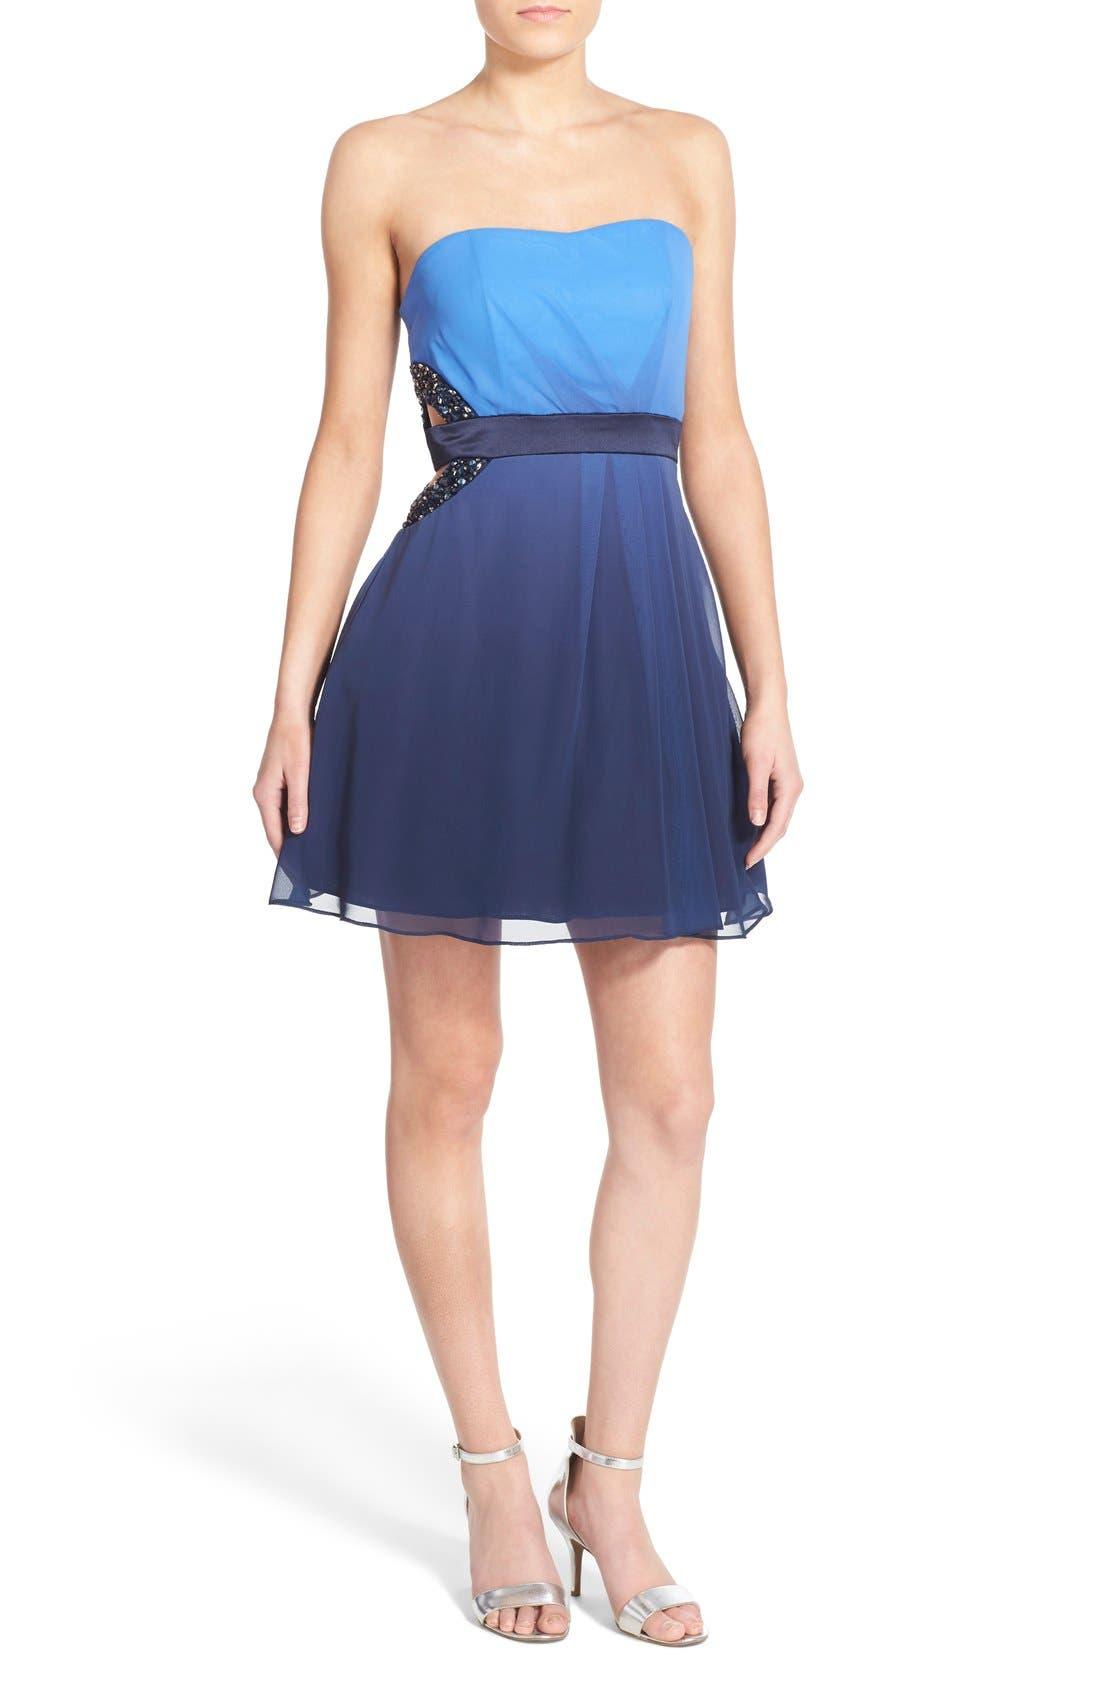 Alternate Image 1 Selected - Dear Moon Embellished Side Cutout Skater Dress